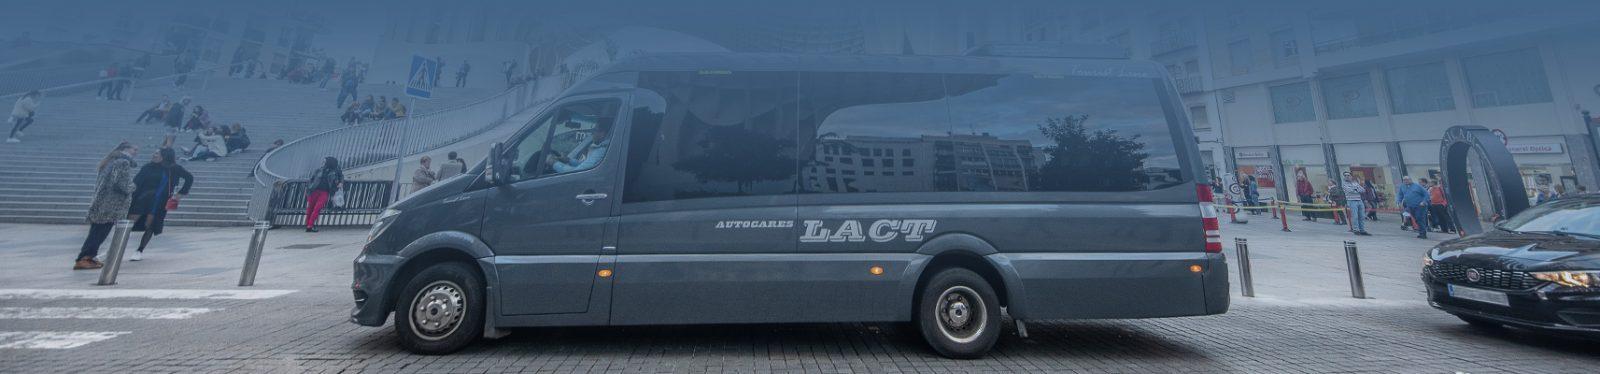 alquiler de minibuses en Sevilla